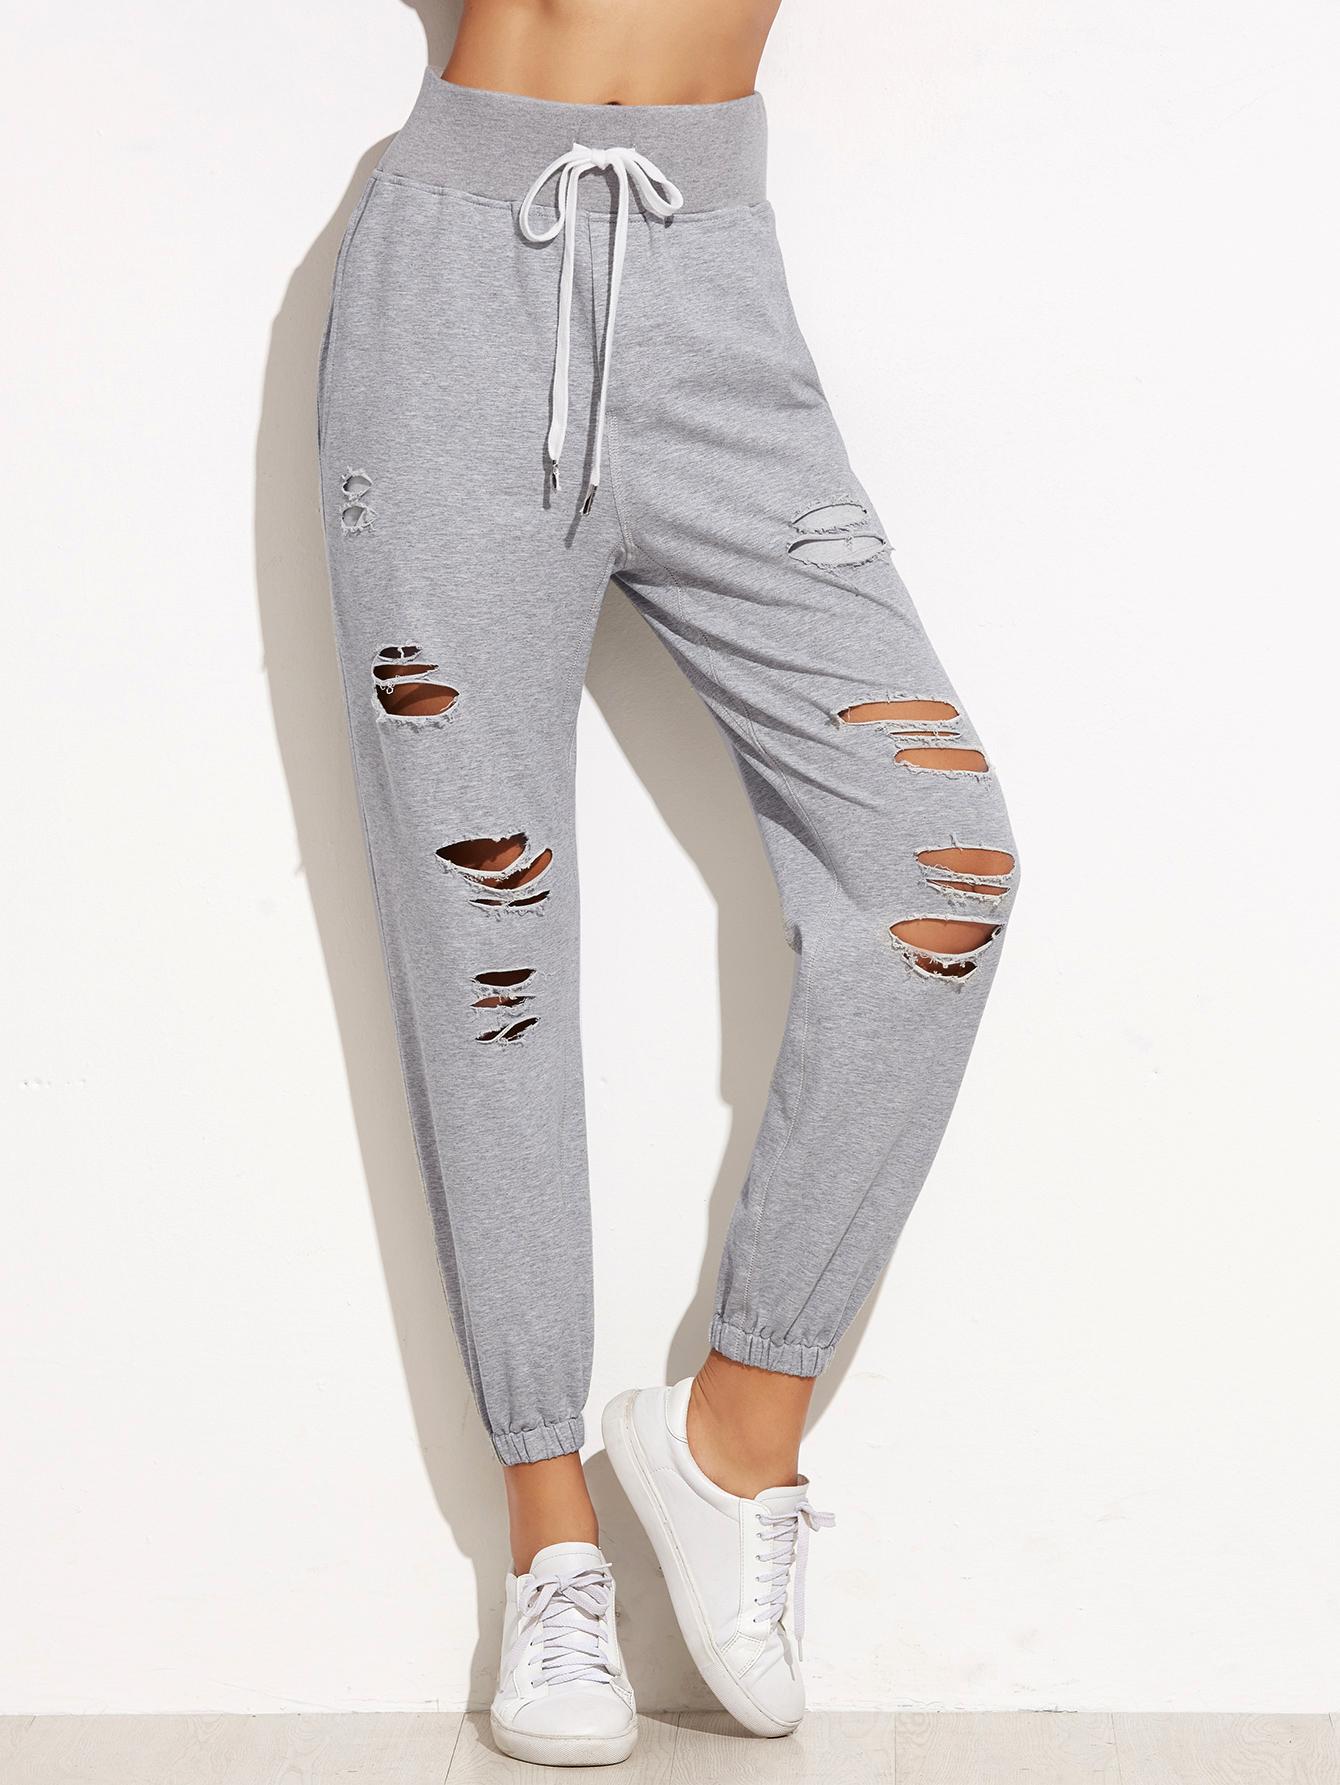 Heather Grey Ripped Elastic Hem Drawstring Pants -SheIn(Sheinside)